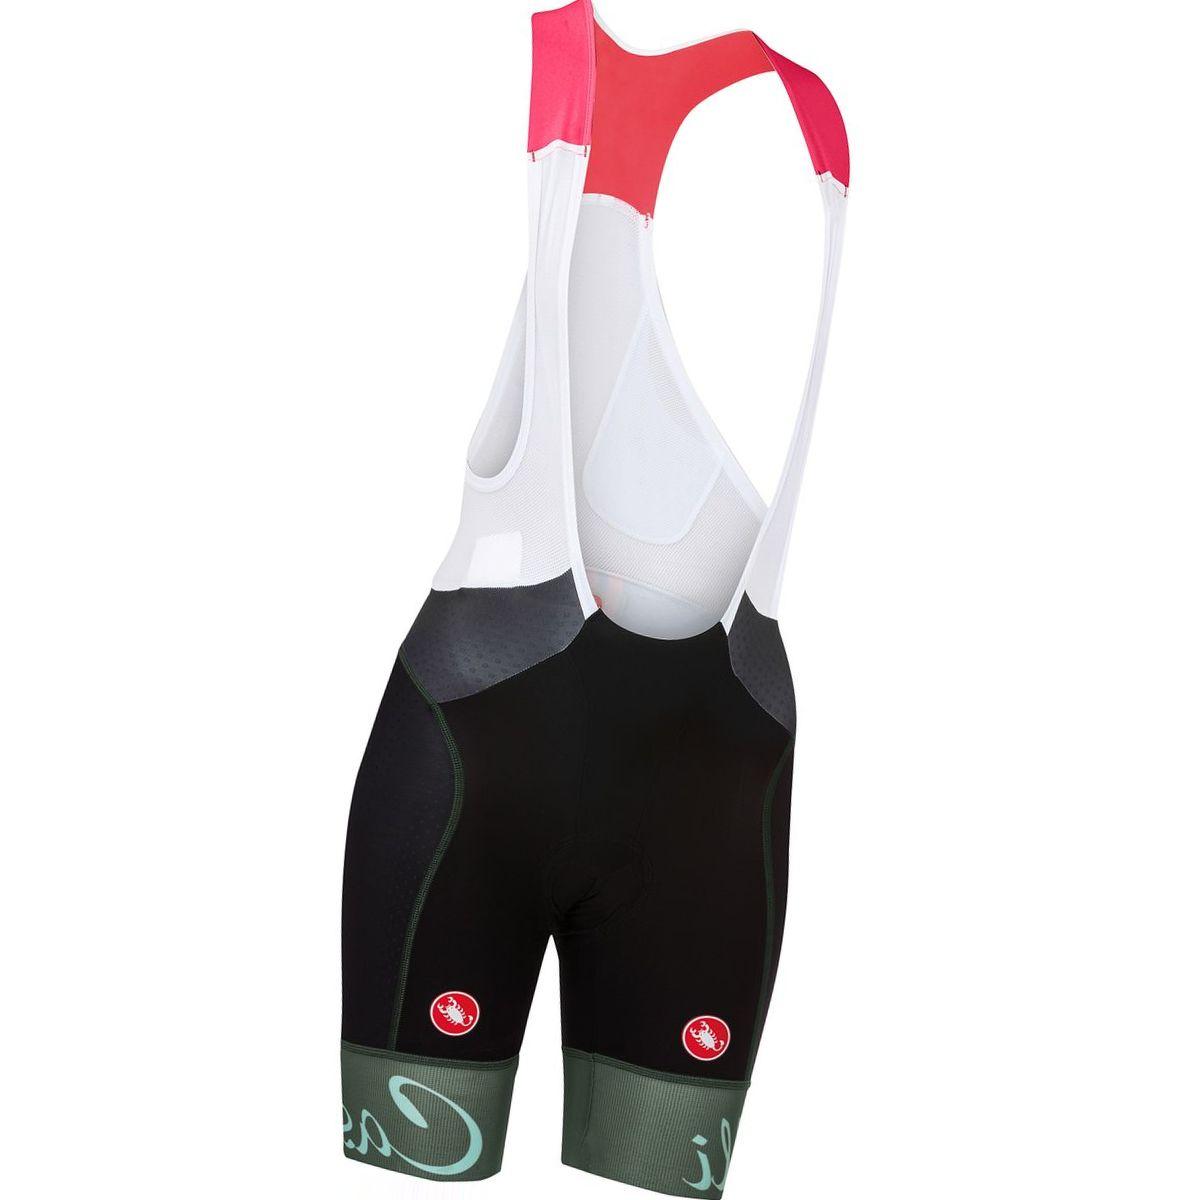 Castelli Free Aero Bib Shorts - Women's